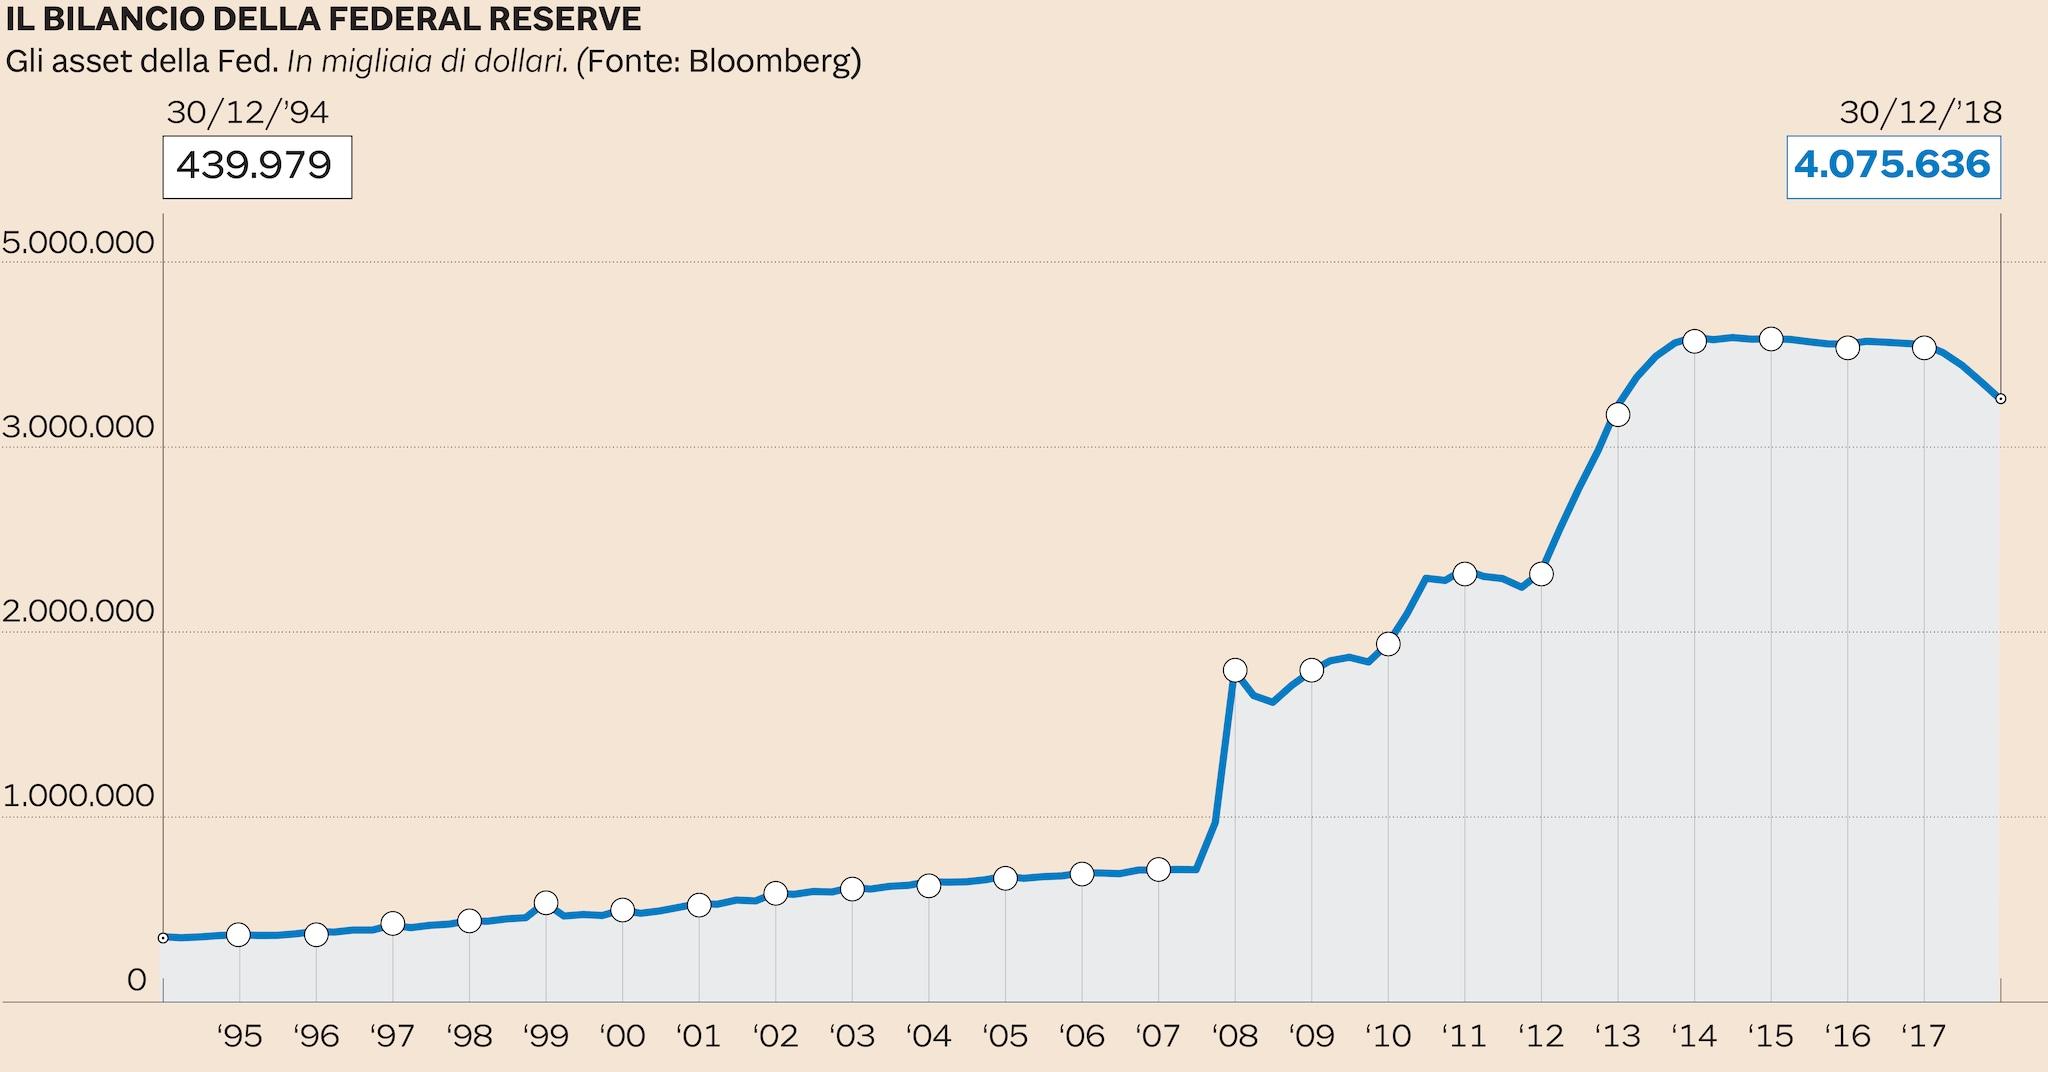 La Fed mantiene i tassi invariati, conferma politica paziente